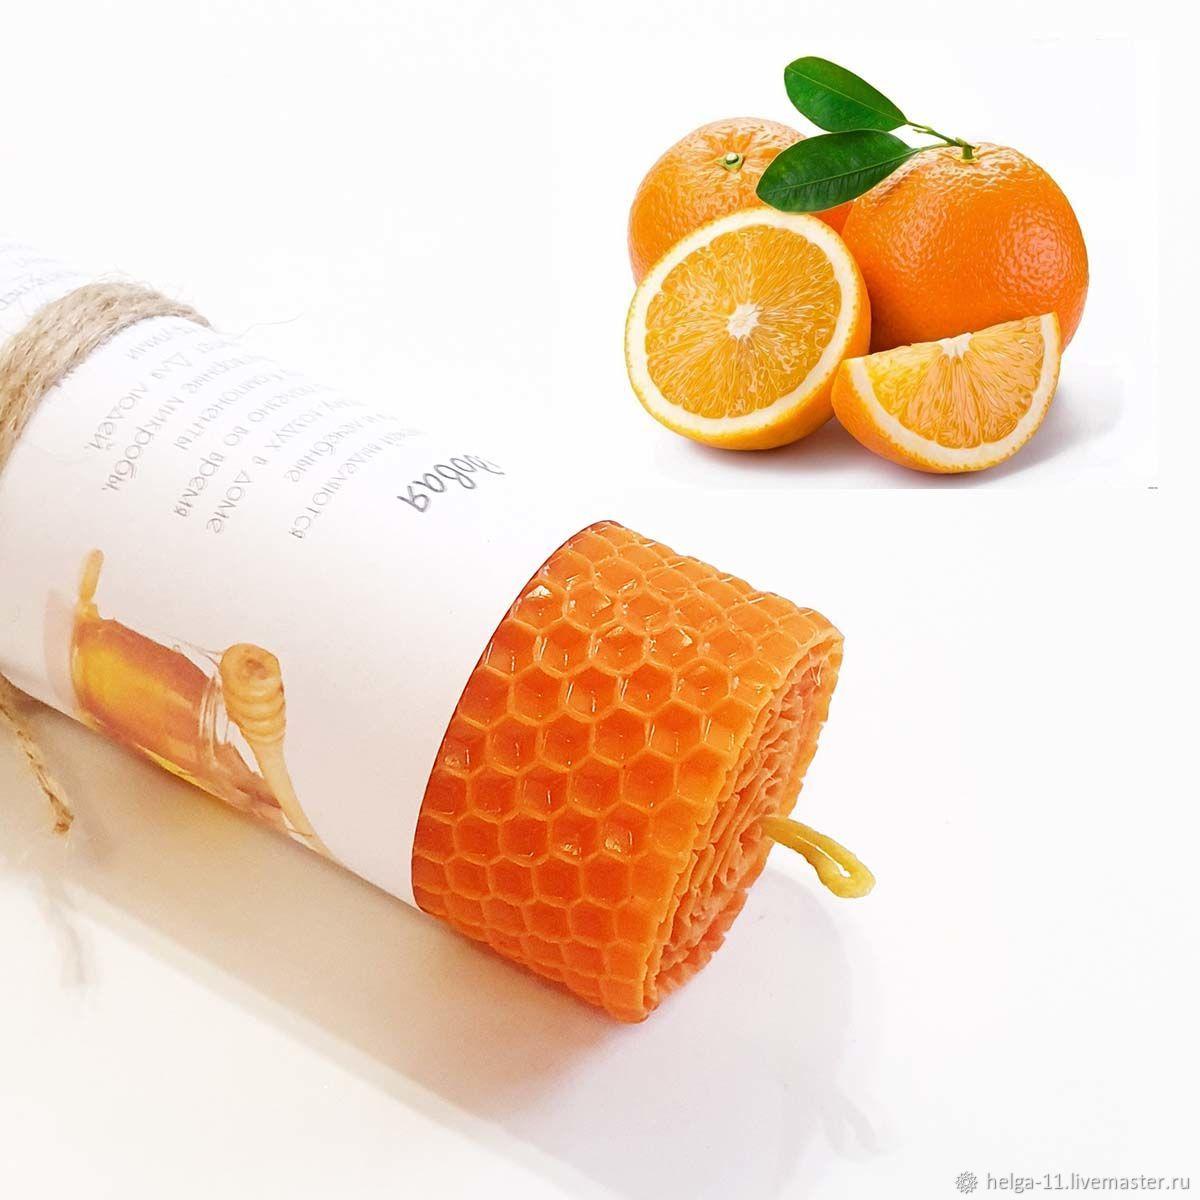 Honey candle-Orange with orange 13h4,7,  cm, Candles, St. Petersburg,  Фото №1